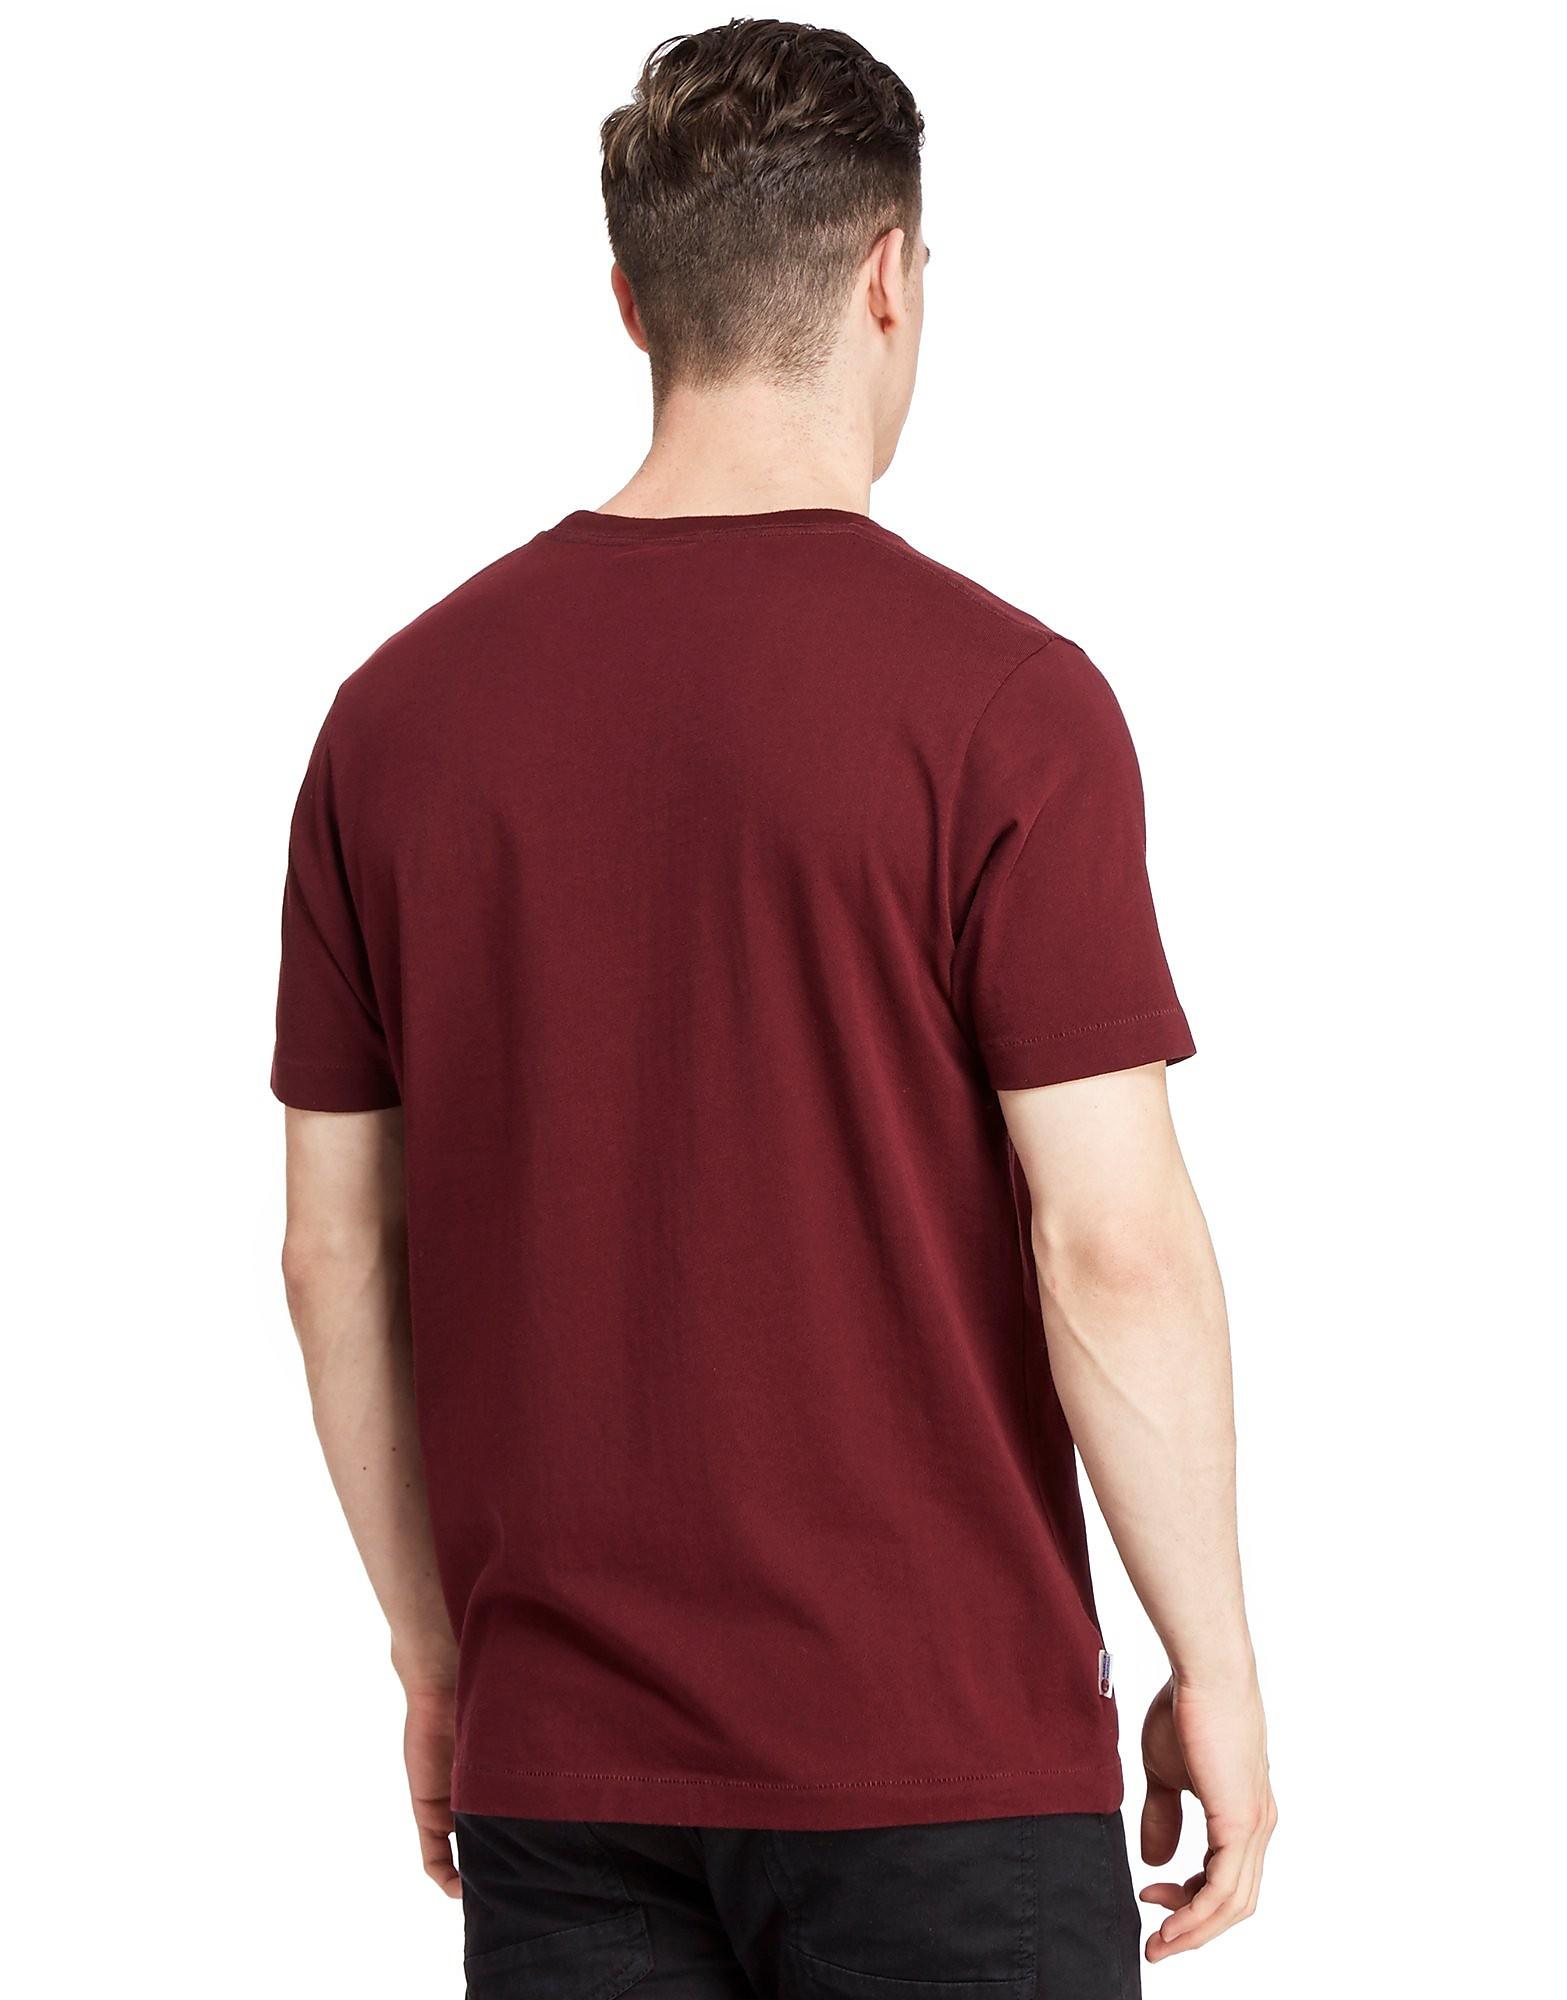 Franklin & Marshall Core Small Logo T-Shirt